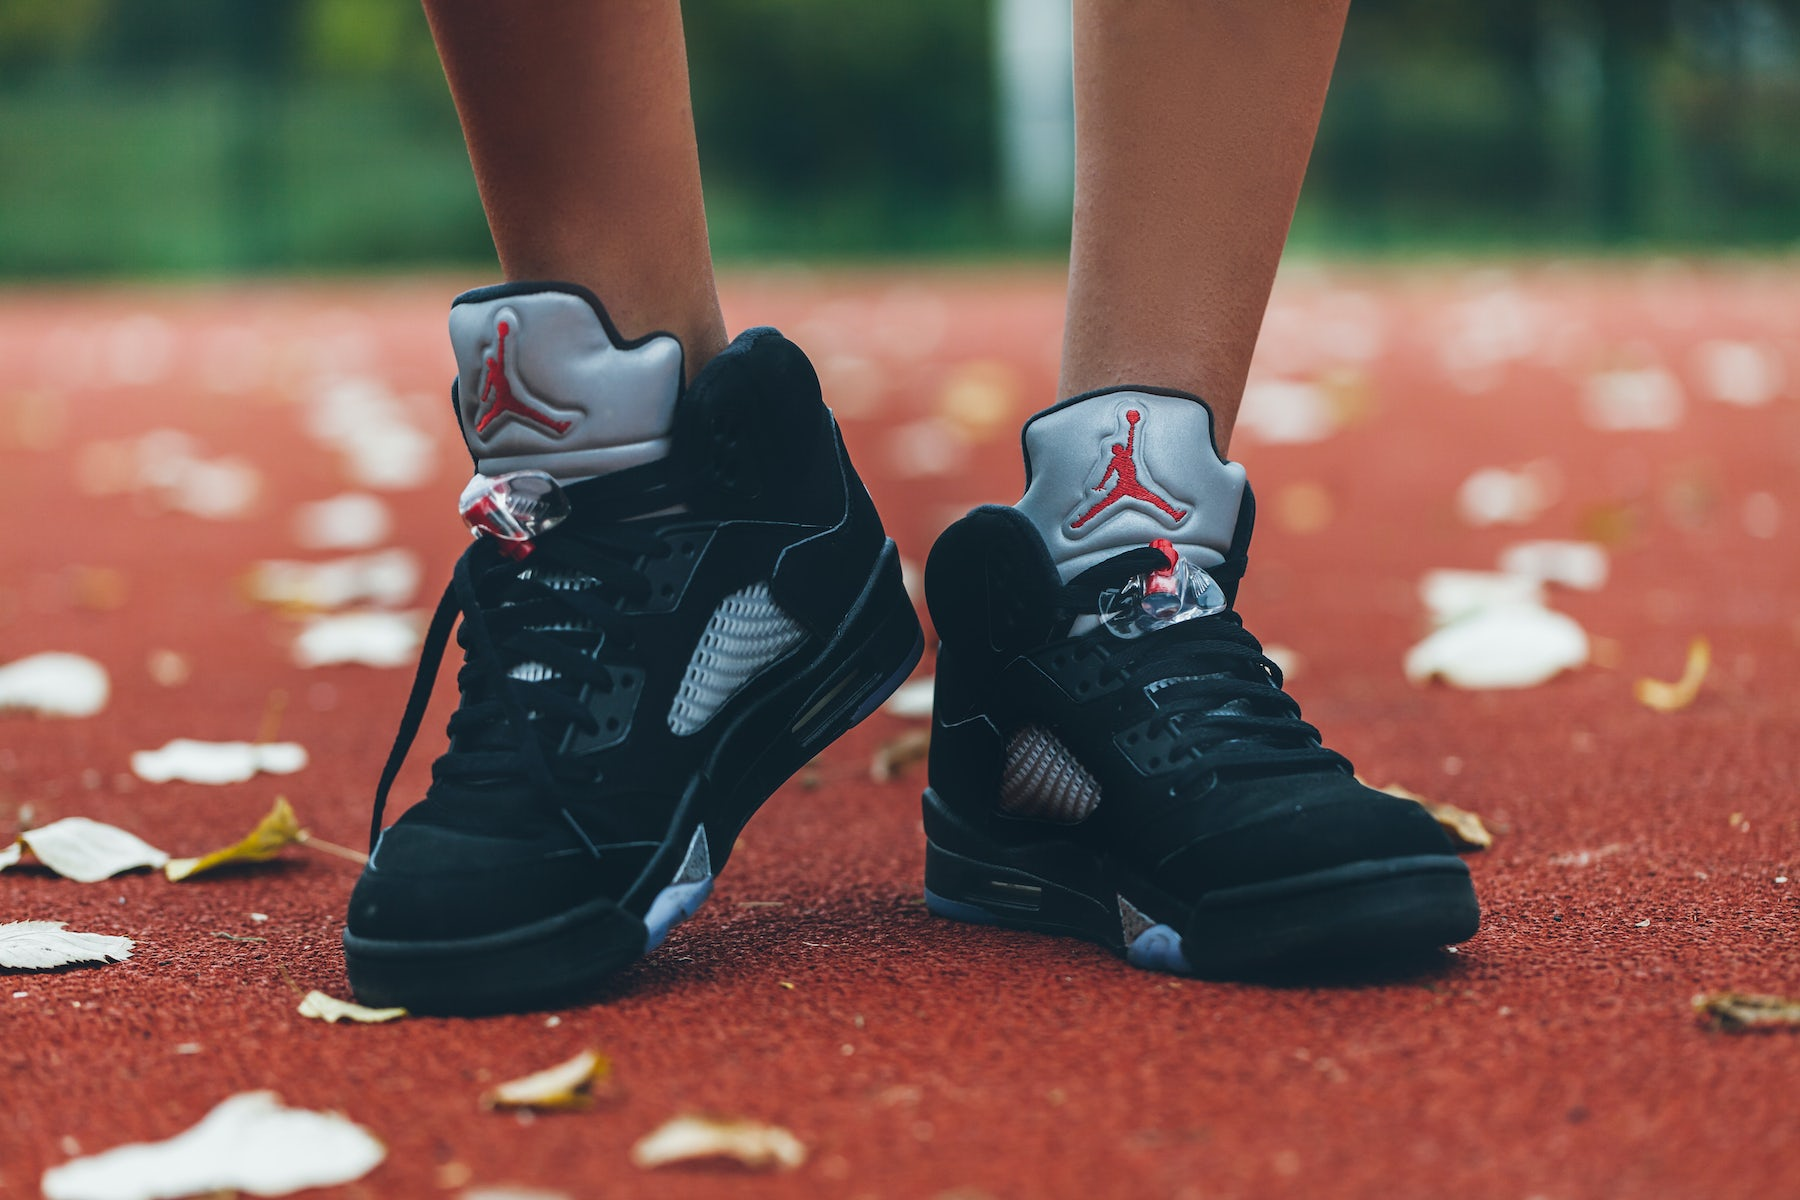 Nike Air Jordan 5 Basketball Shoes | Source: Shutterstock